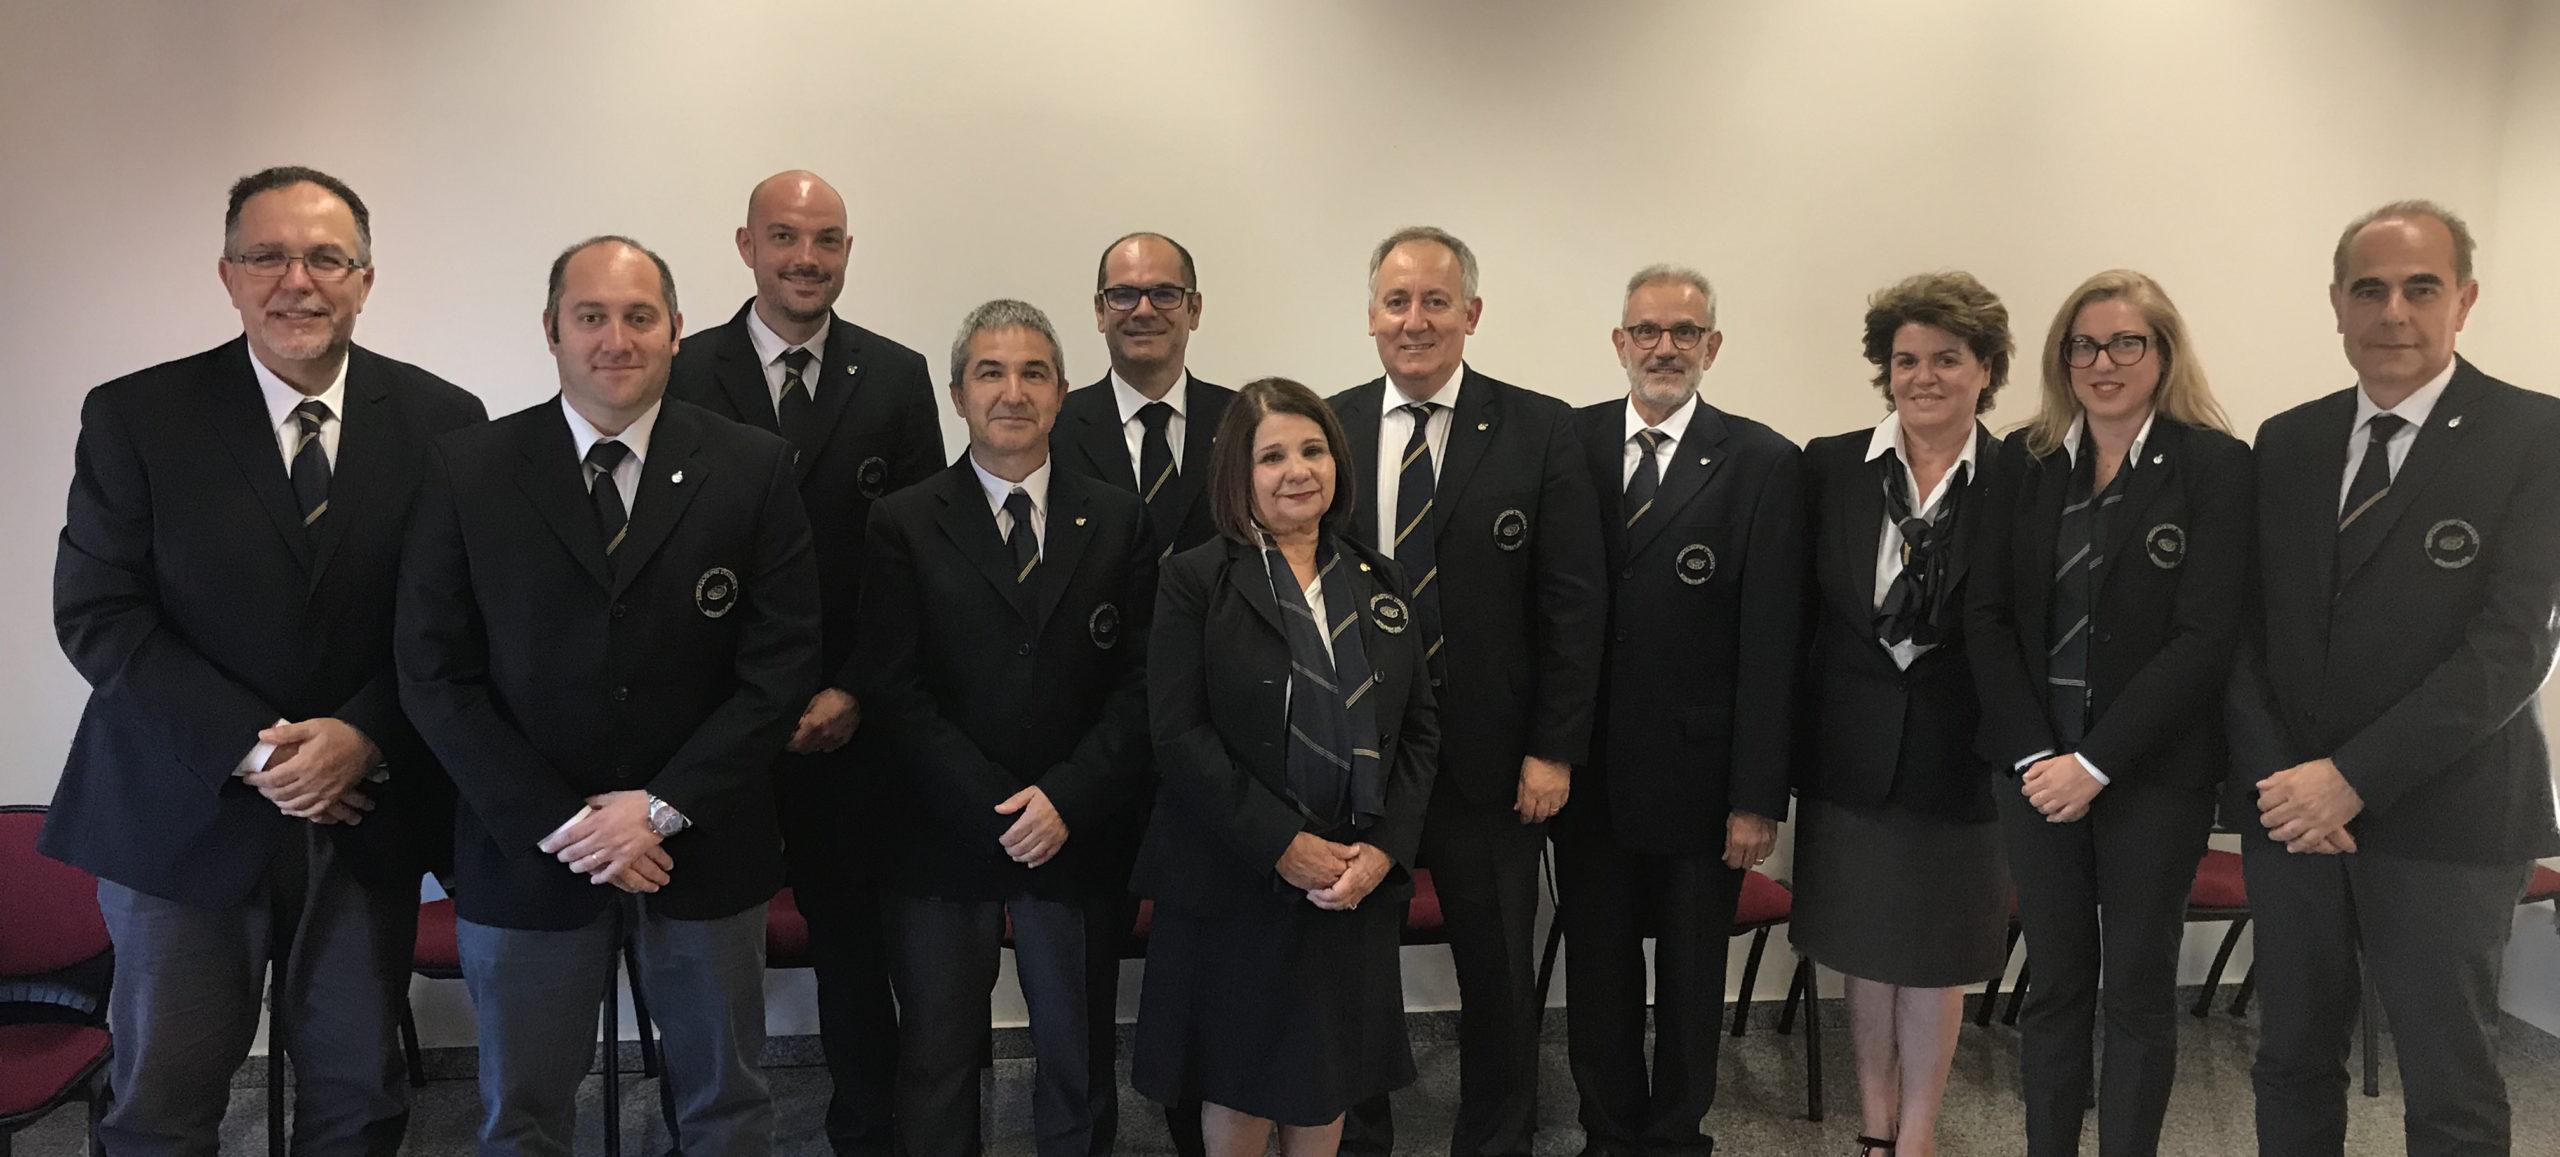 Intervista al Presidente di AIS Sardegna